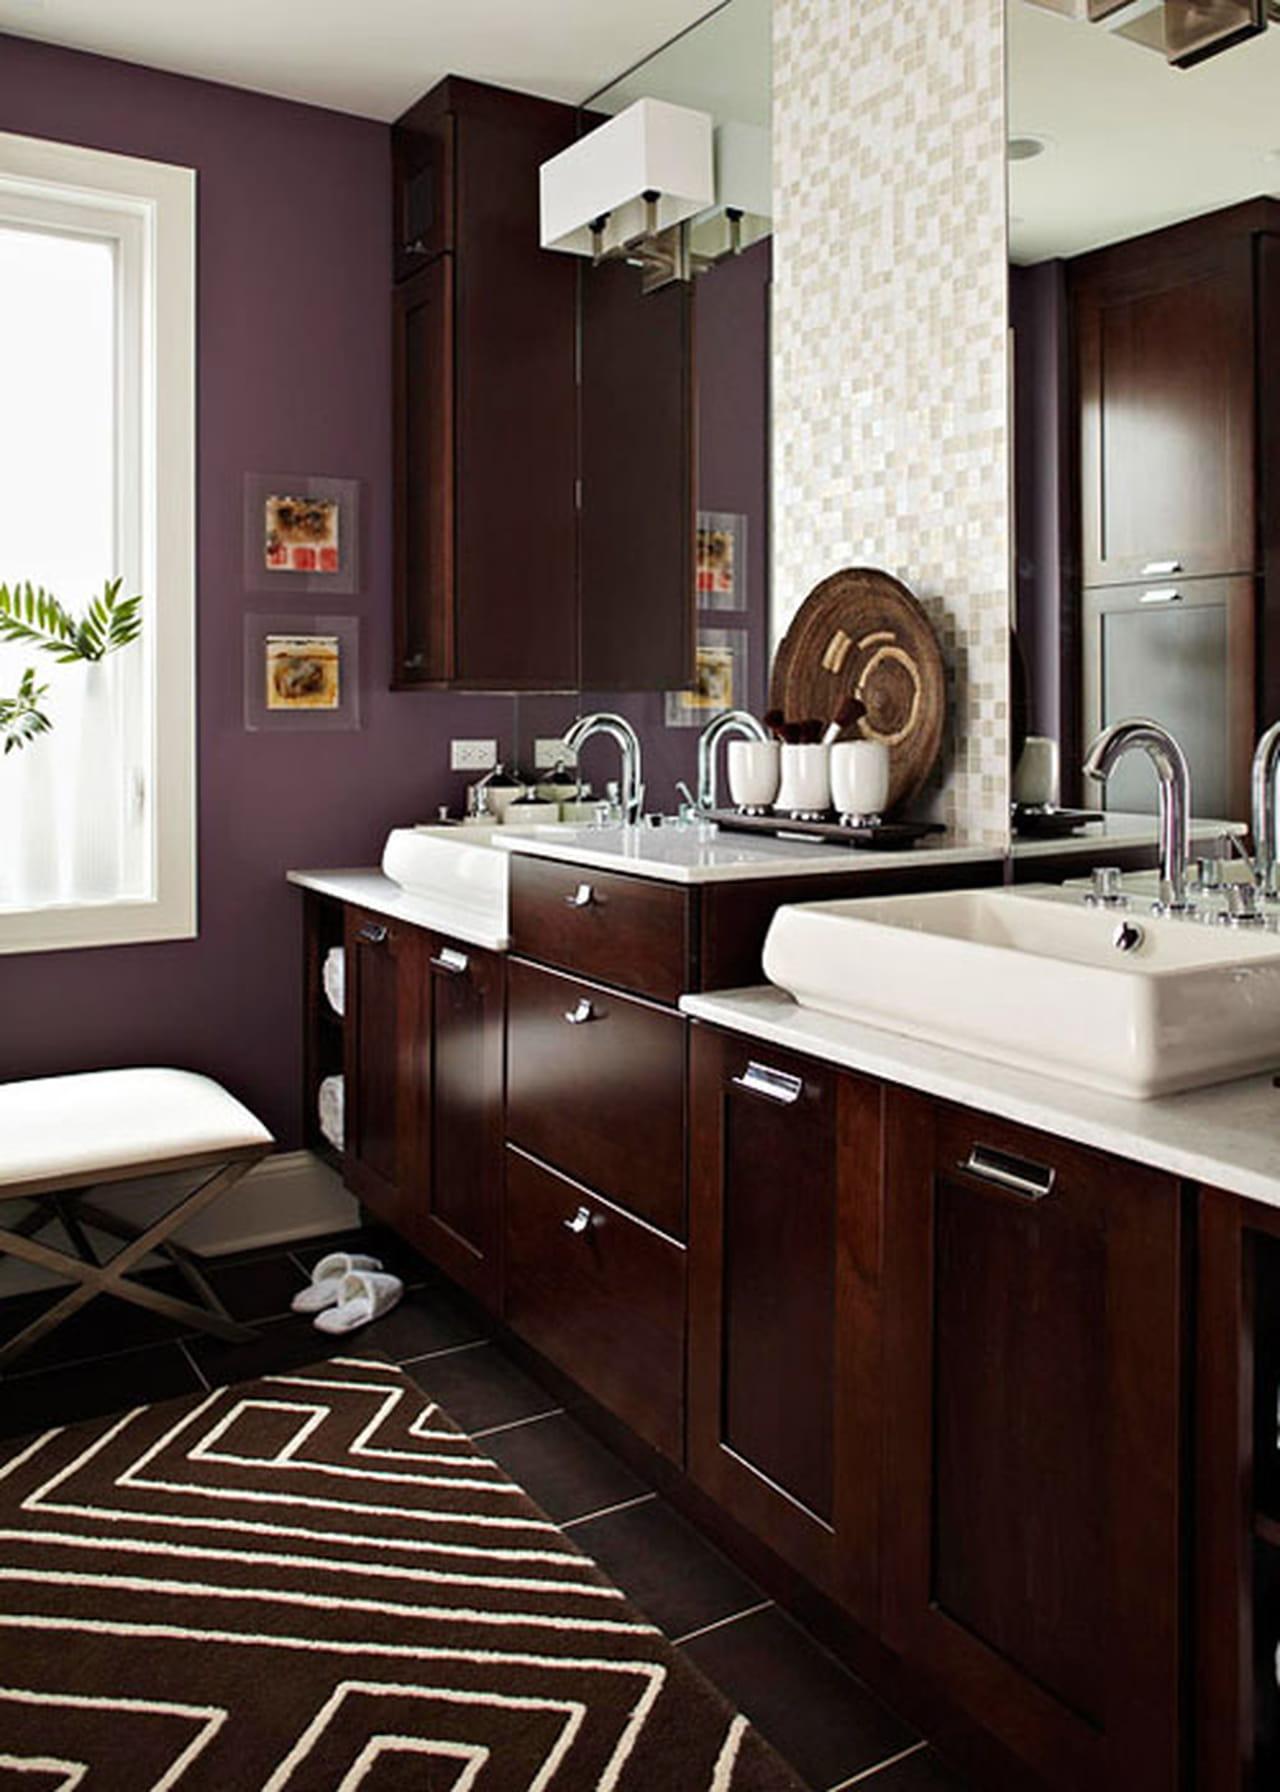 Elegant Beige Taupe And Cream Colored Bathroom Tile: أفكار جذابة لتنسيق الألوان في ديكور الحمام